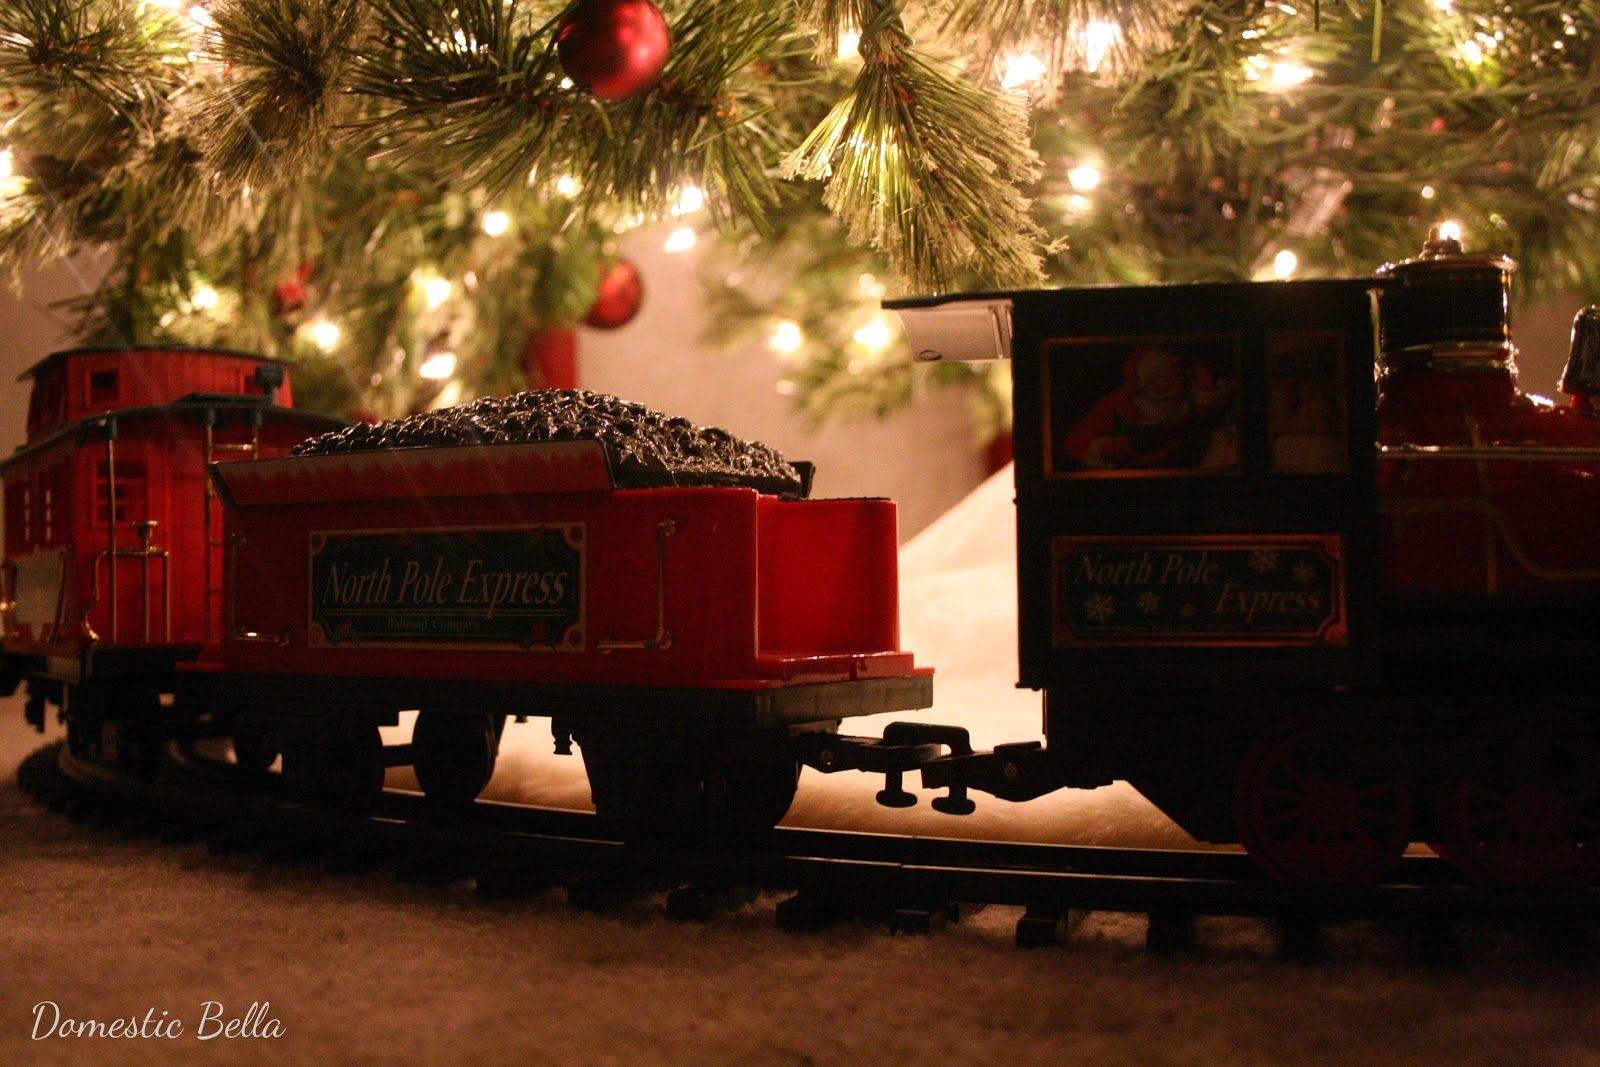 Christmas tree train north pole express christmas decorating